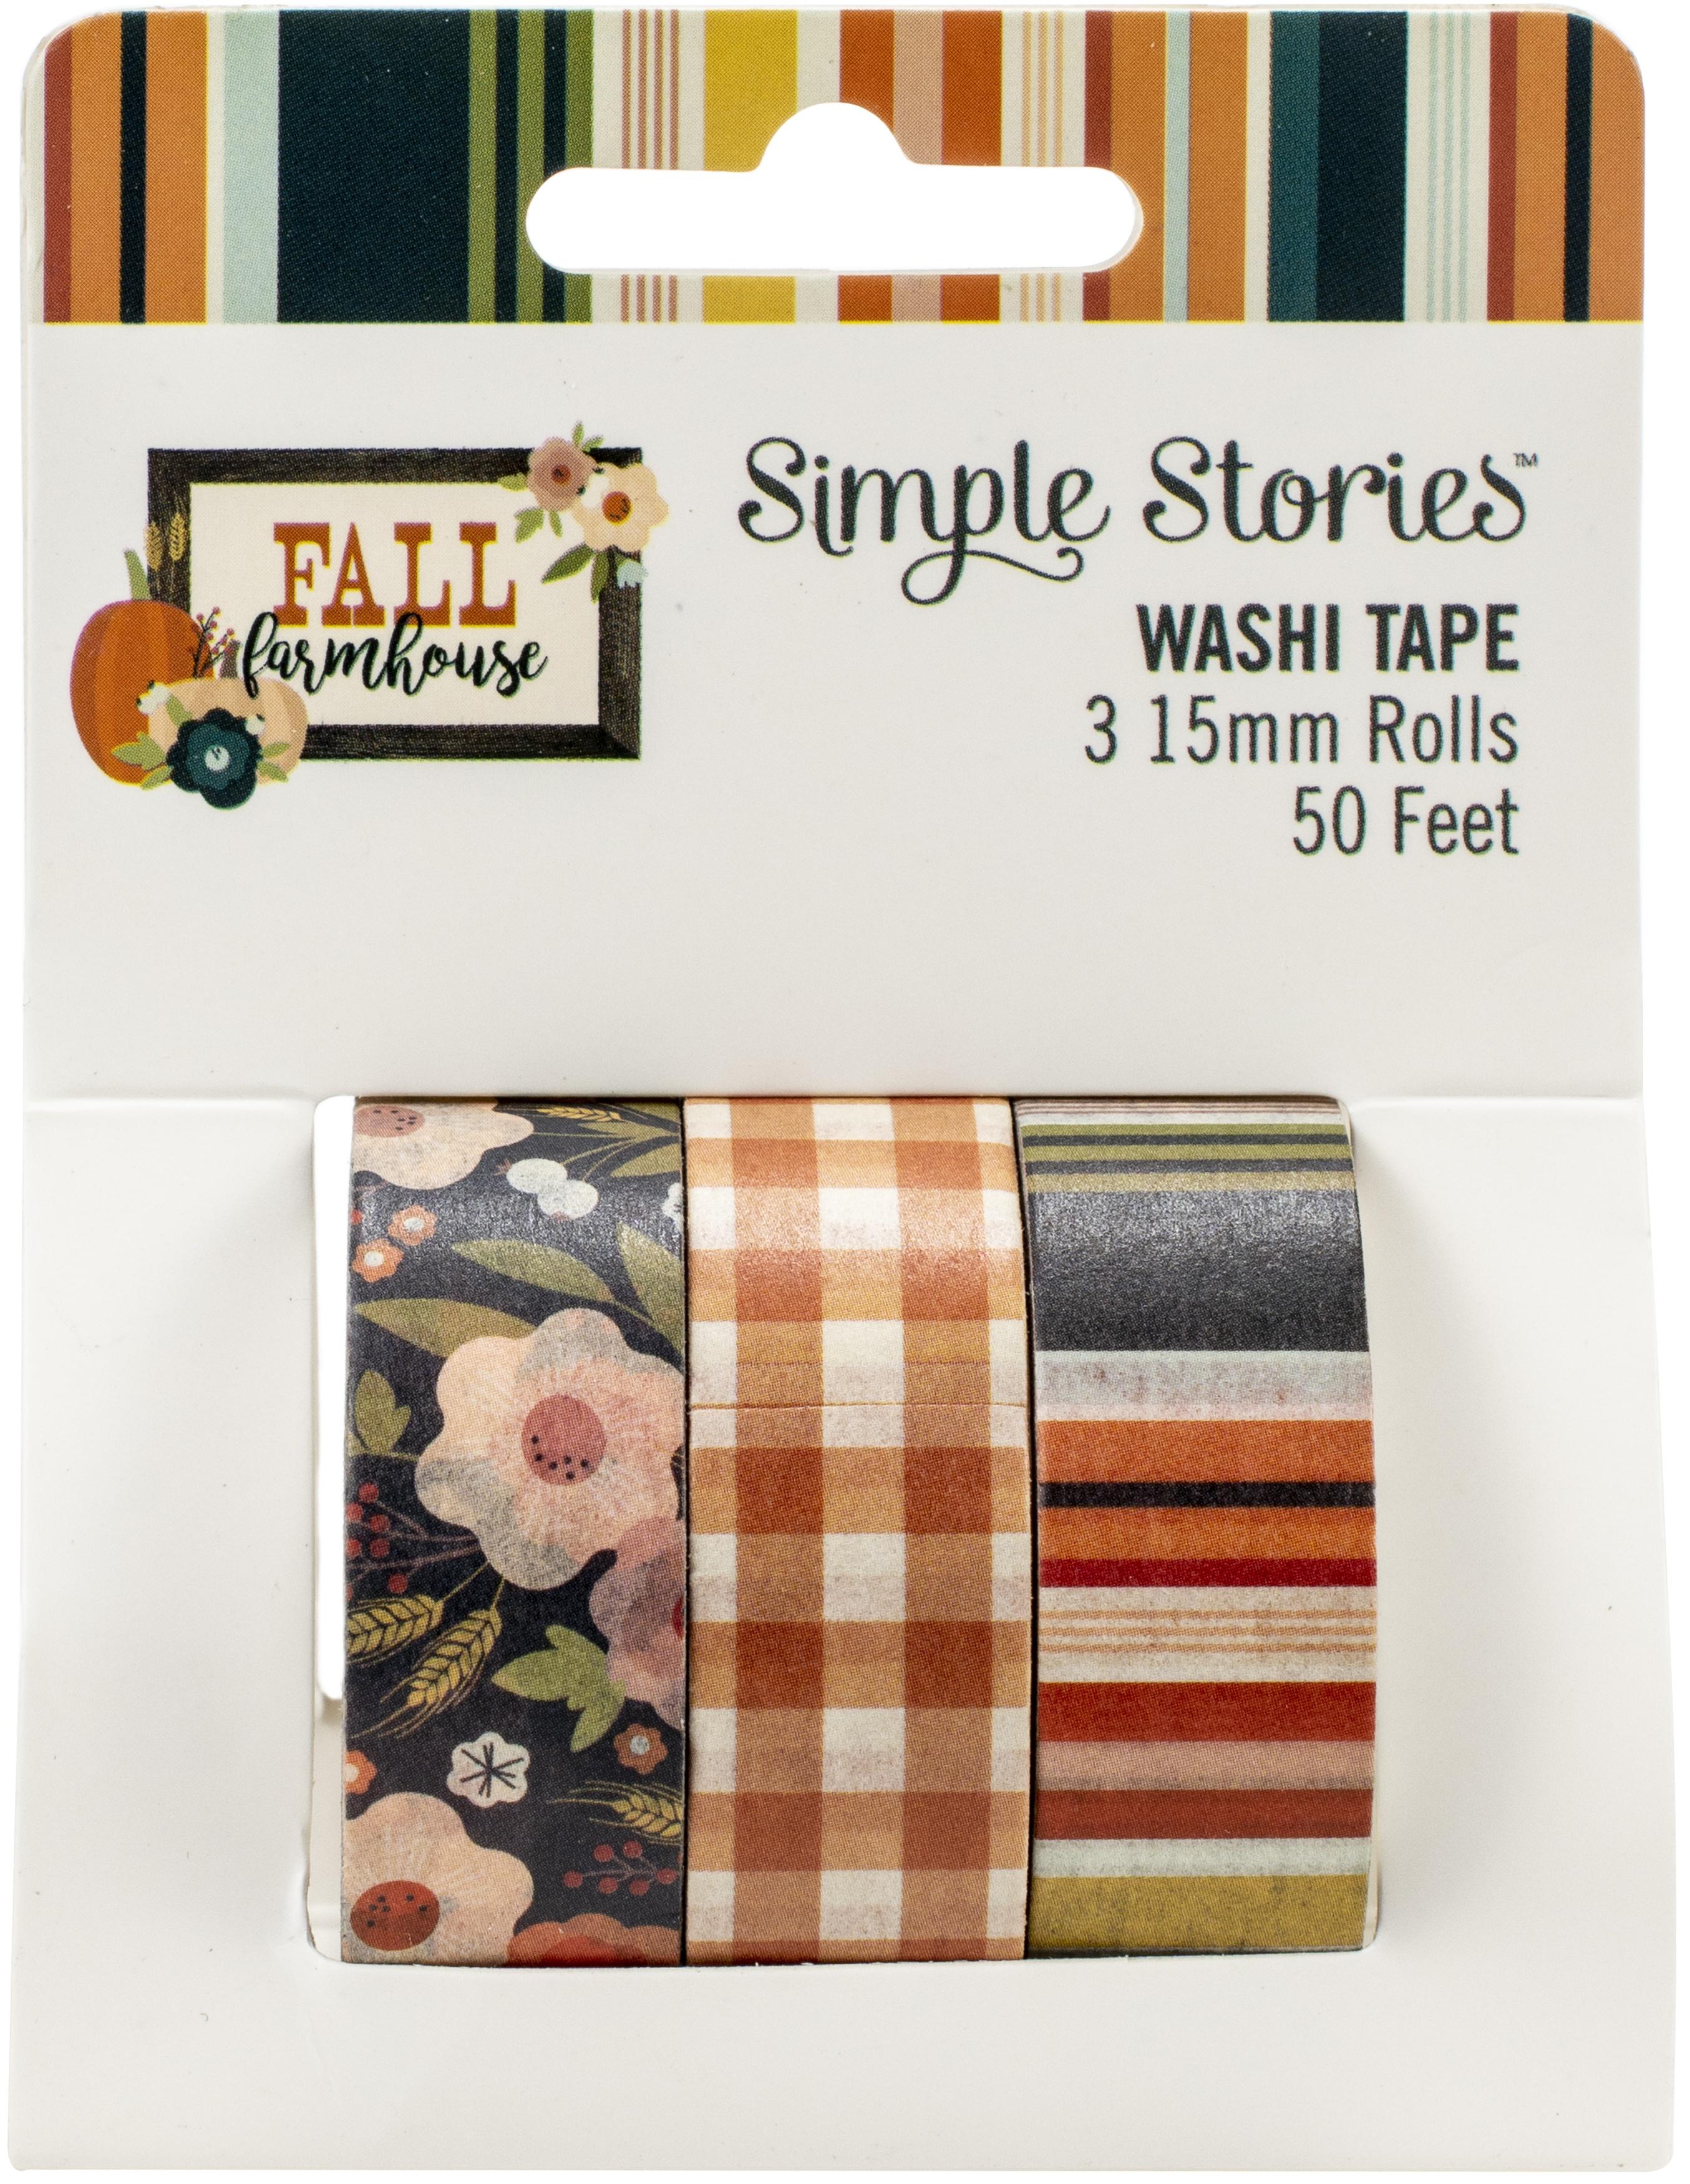 Simple Stories Fall Farmhouse Washi Tape 3/Pkg-